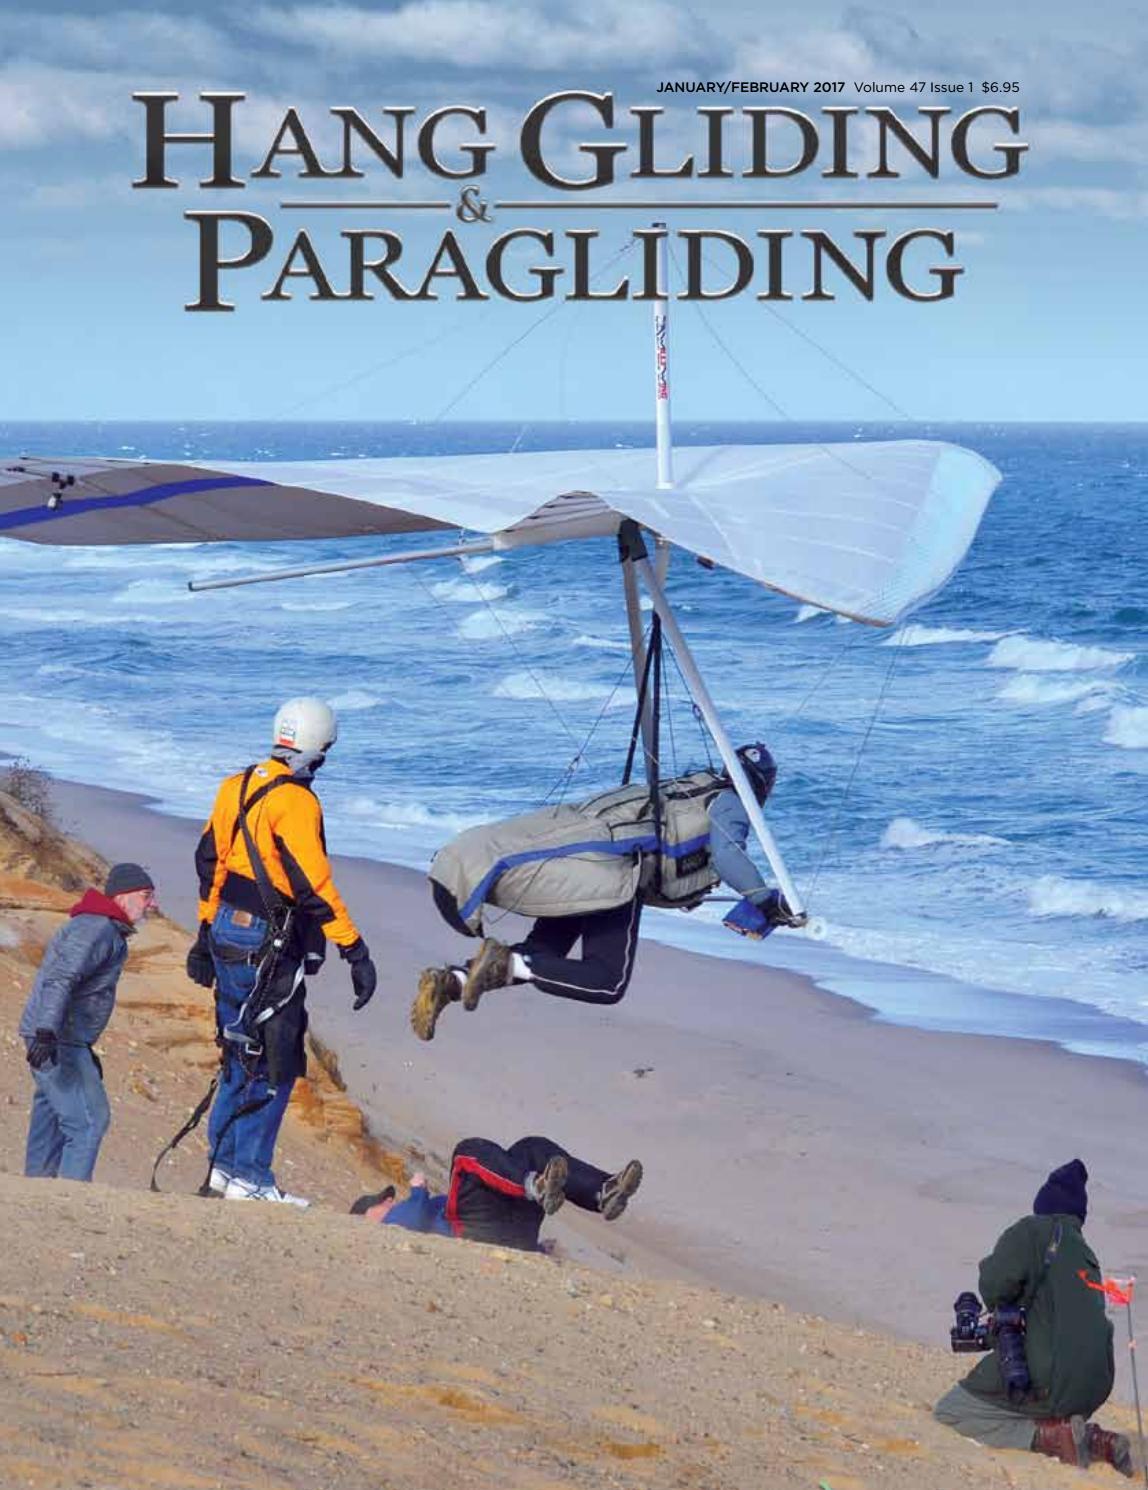 Hang Gliding & Paragliding Vol47-Iss1 Jan-Feb 2017 by US Hang